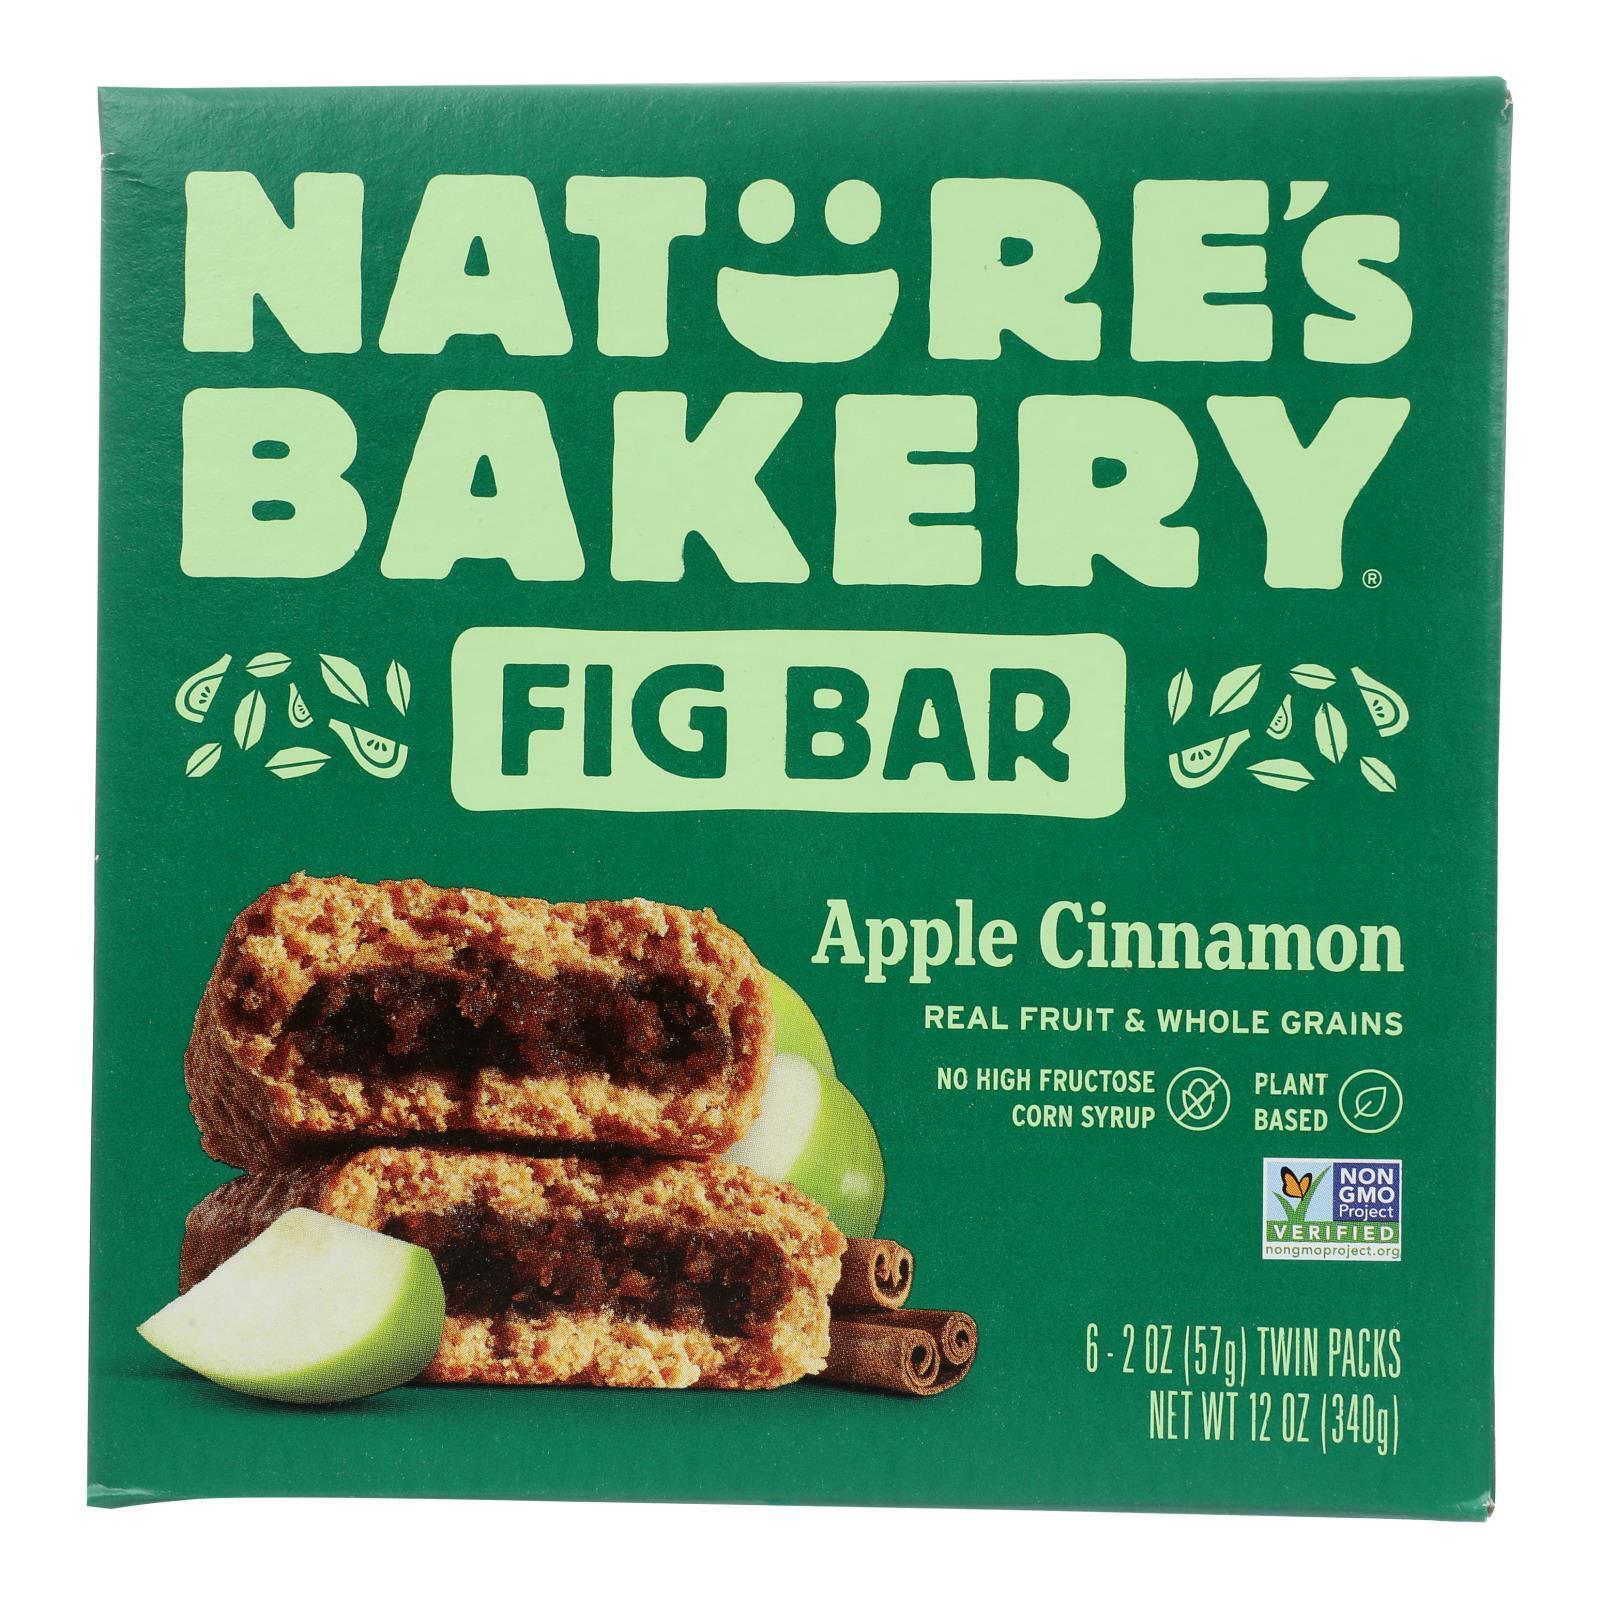 Nature's Bakery Stone Ground Whole Wheat Fig Bar - Apple Cinnamon - Case of 6 - 2 oz.